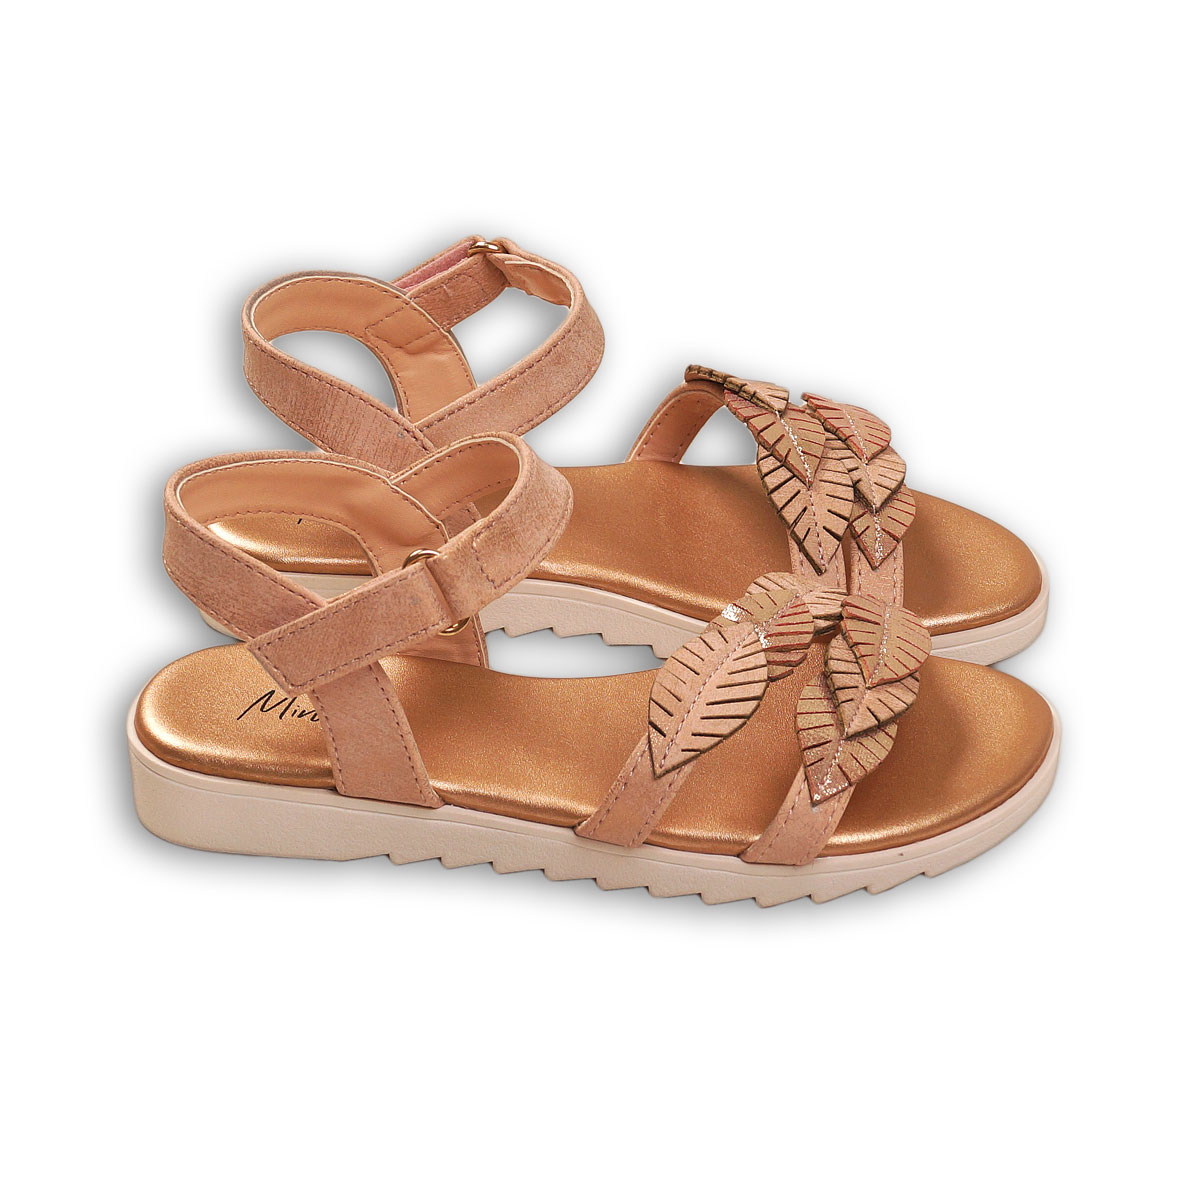 Sandale cu detaliu de frunze si inchidere in curea la glezna, Minoti Shoe